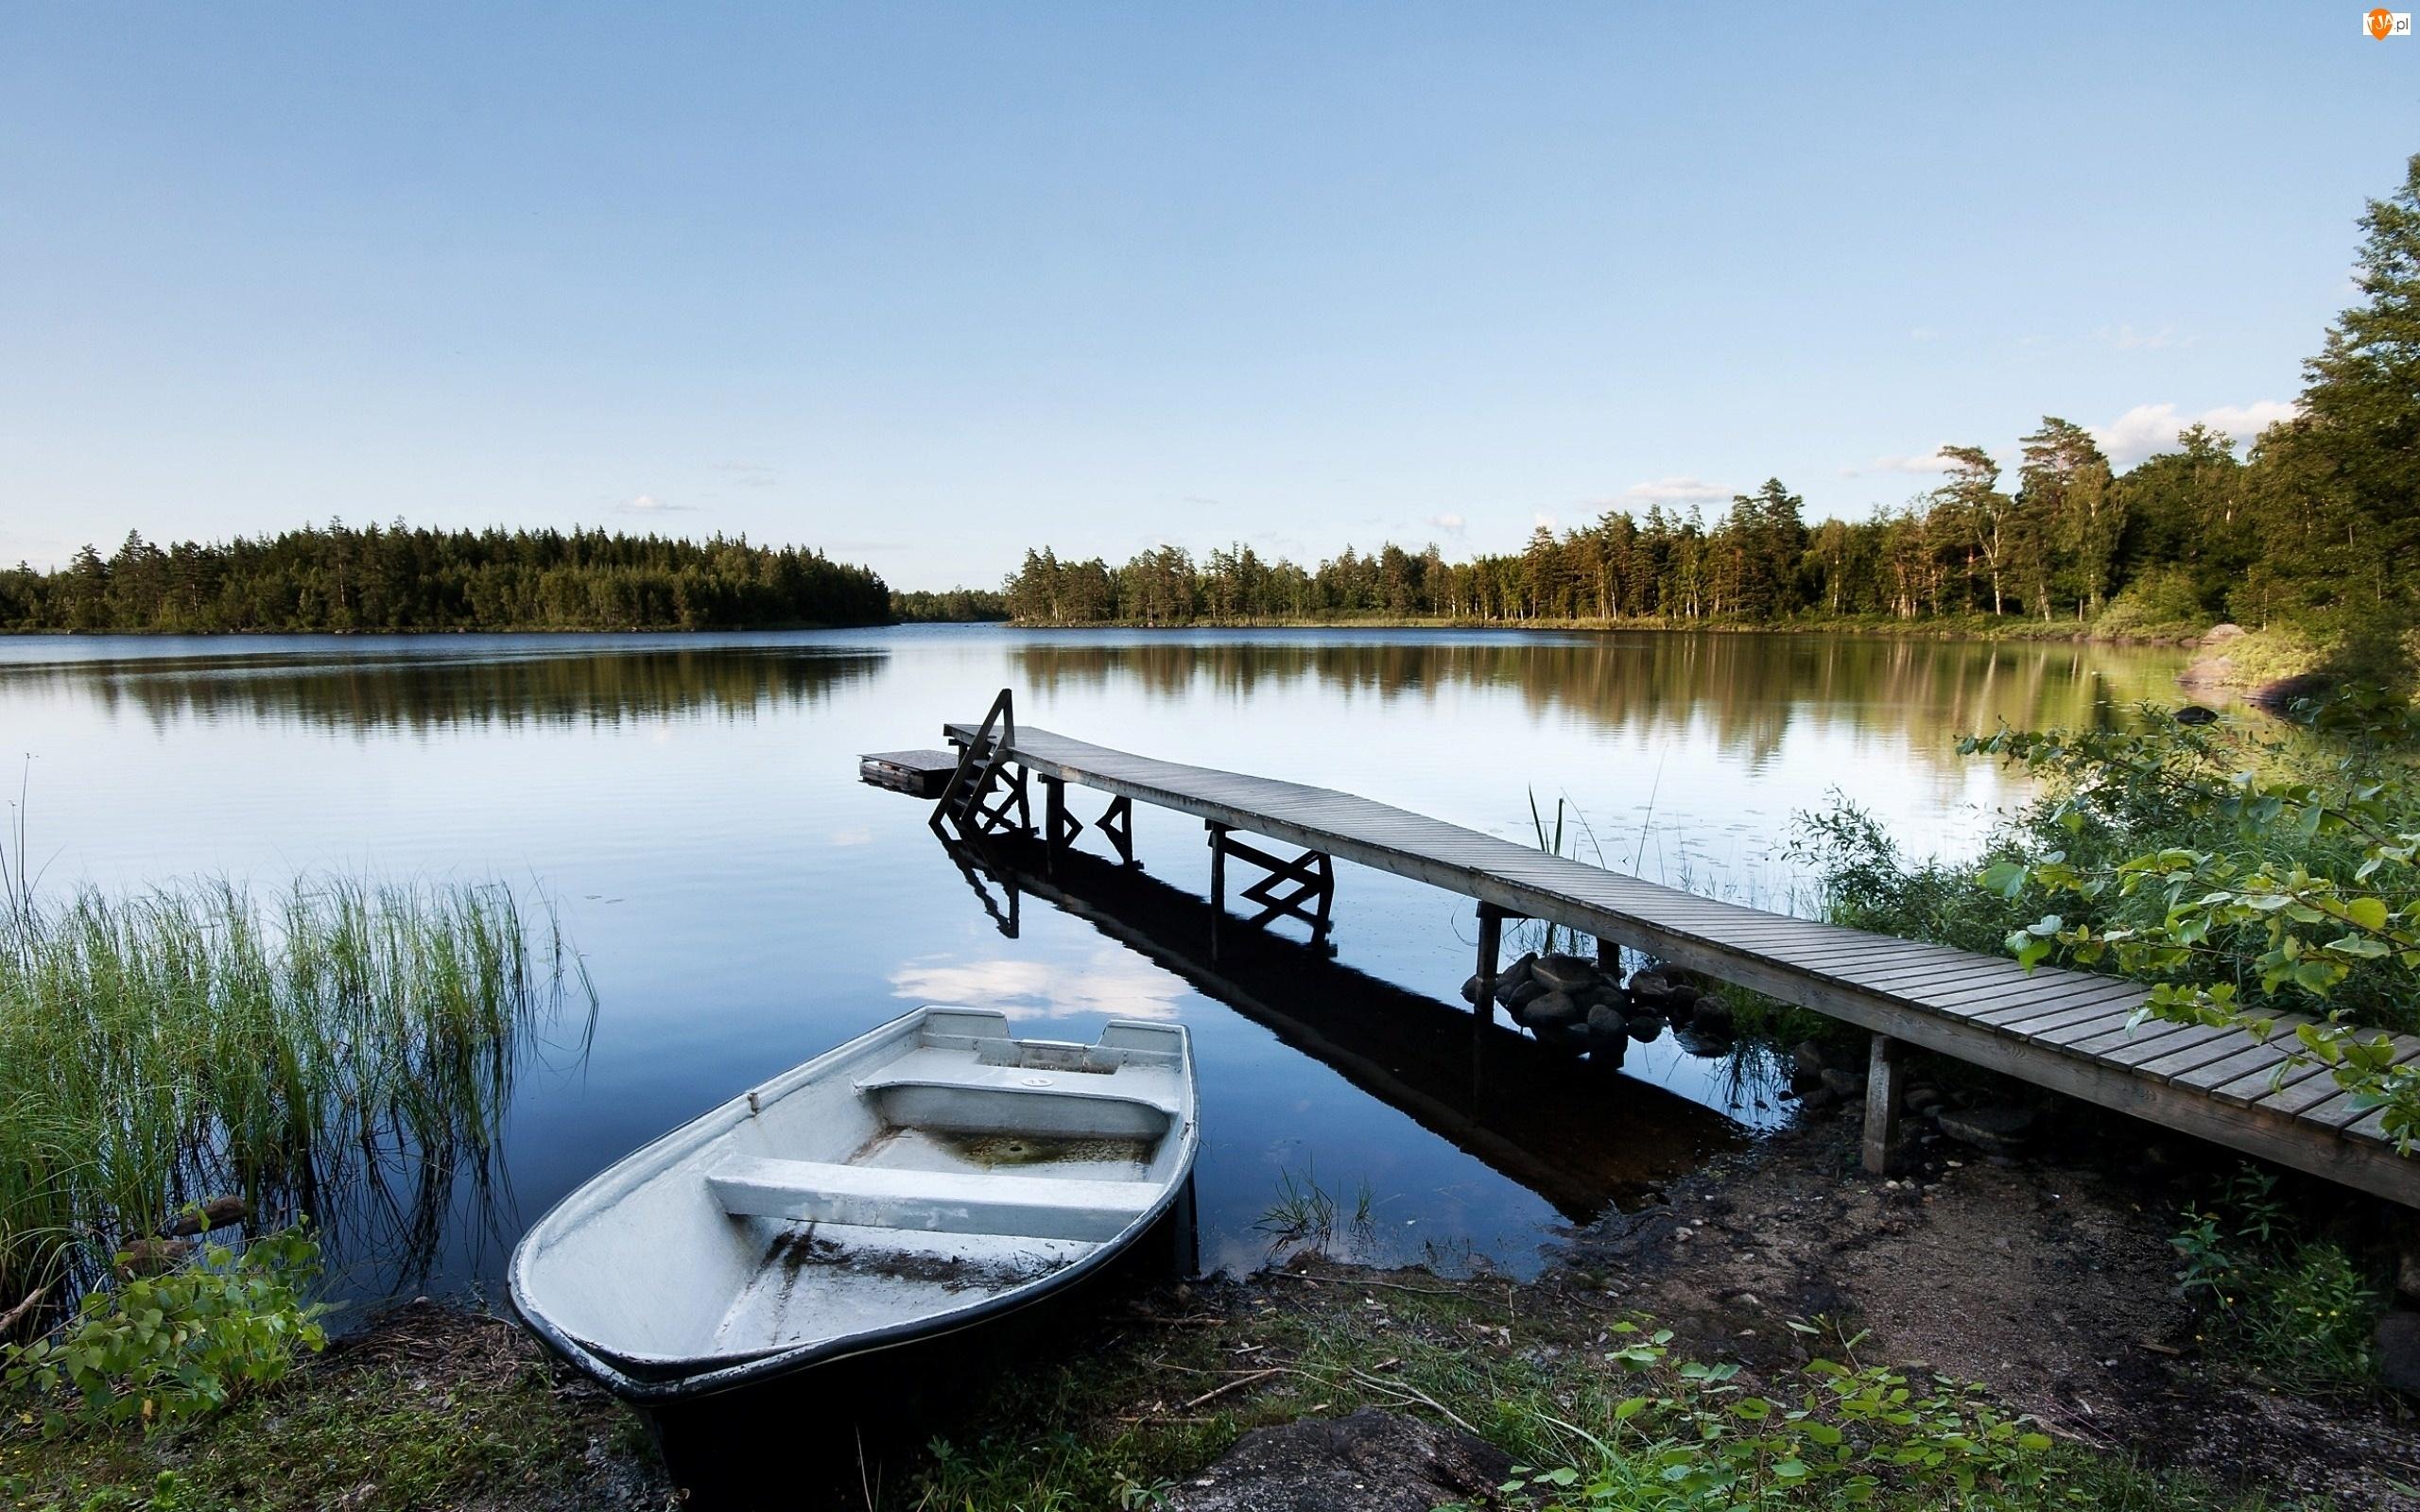 Łódka, Las, Jezioro, Pomost